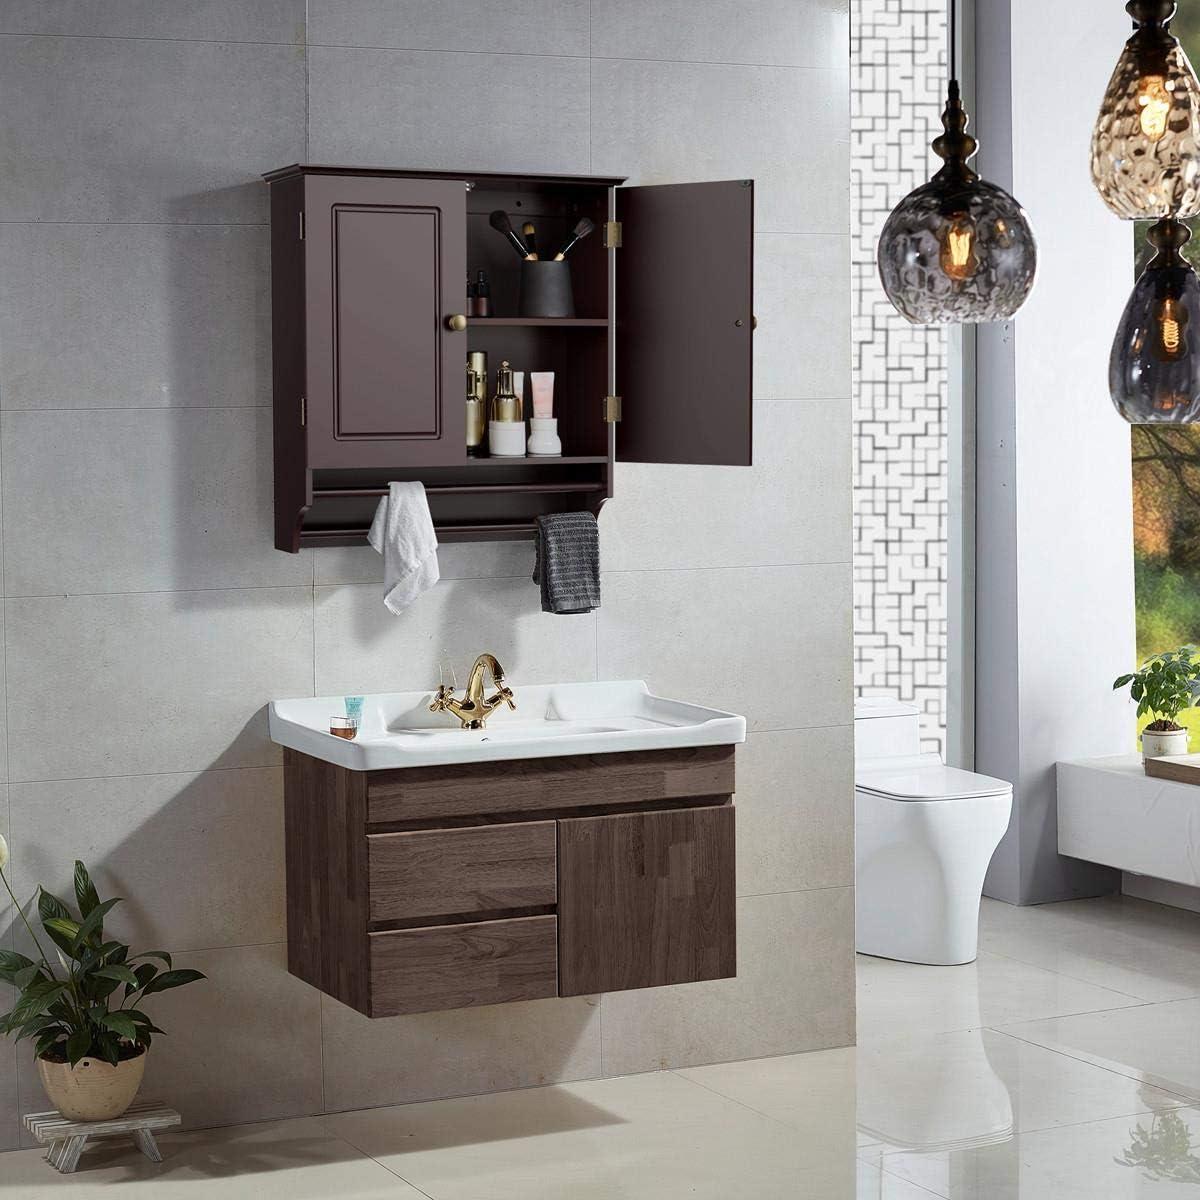 Buy Yaheetech Bathroom Kitchen Wall Storage Cabinet Collection Wall Cabinet 2 Door Wall Cabinet Espresso Online In Italy B07fgc35xy